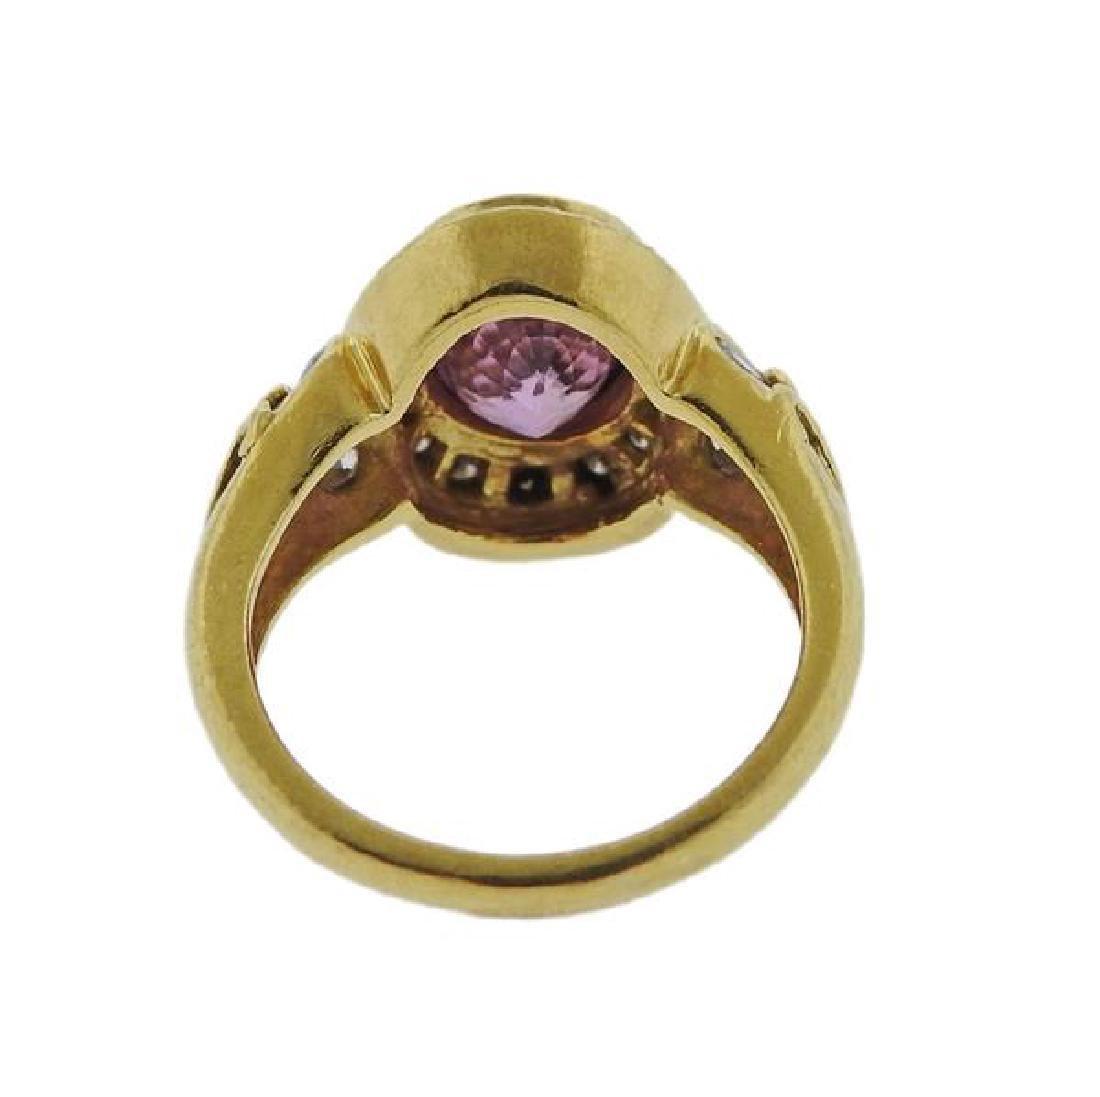 Helen Woodhull 18k Gold Diamond Pink sapphire Ring - 3